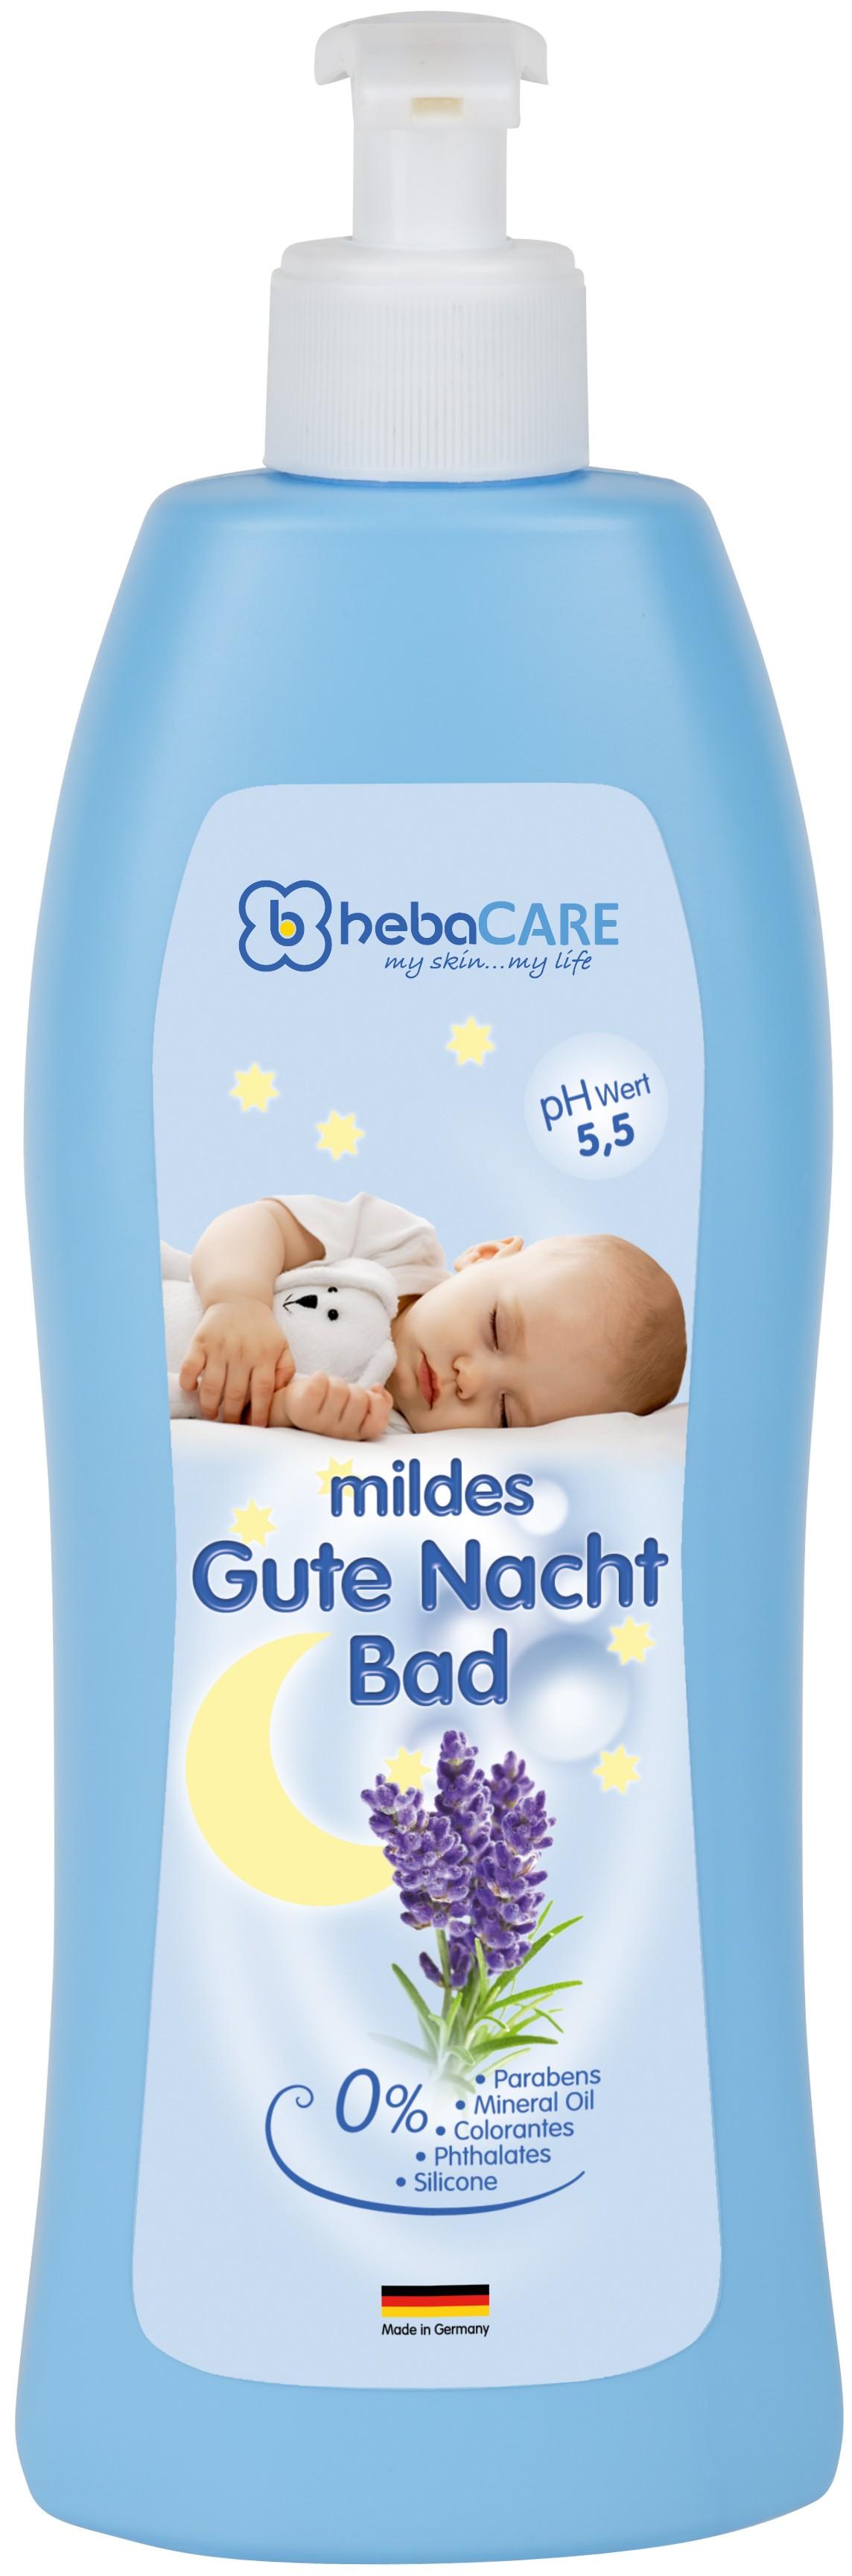 hebaCARE Gute Nacht Bad sensitiv